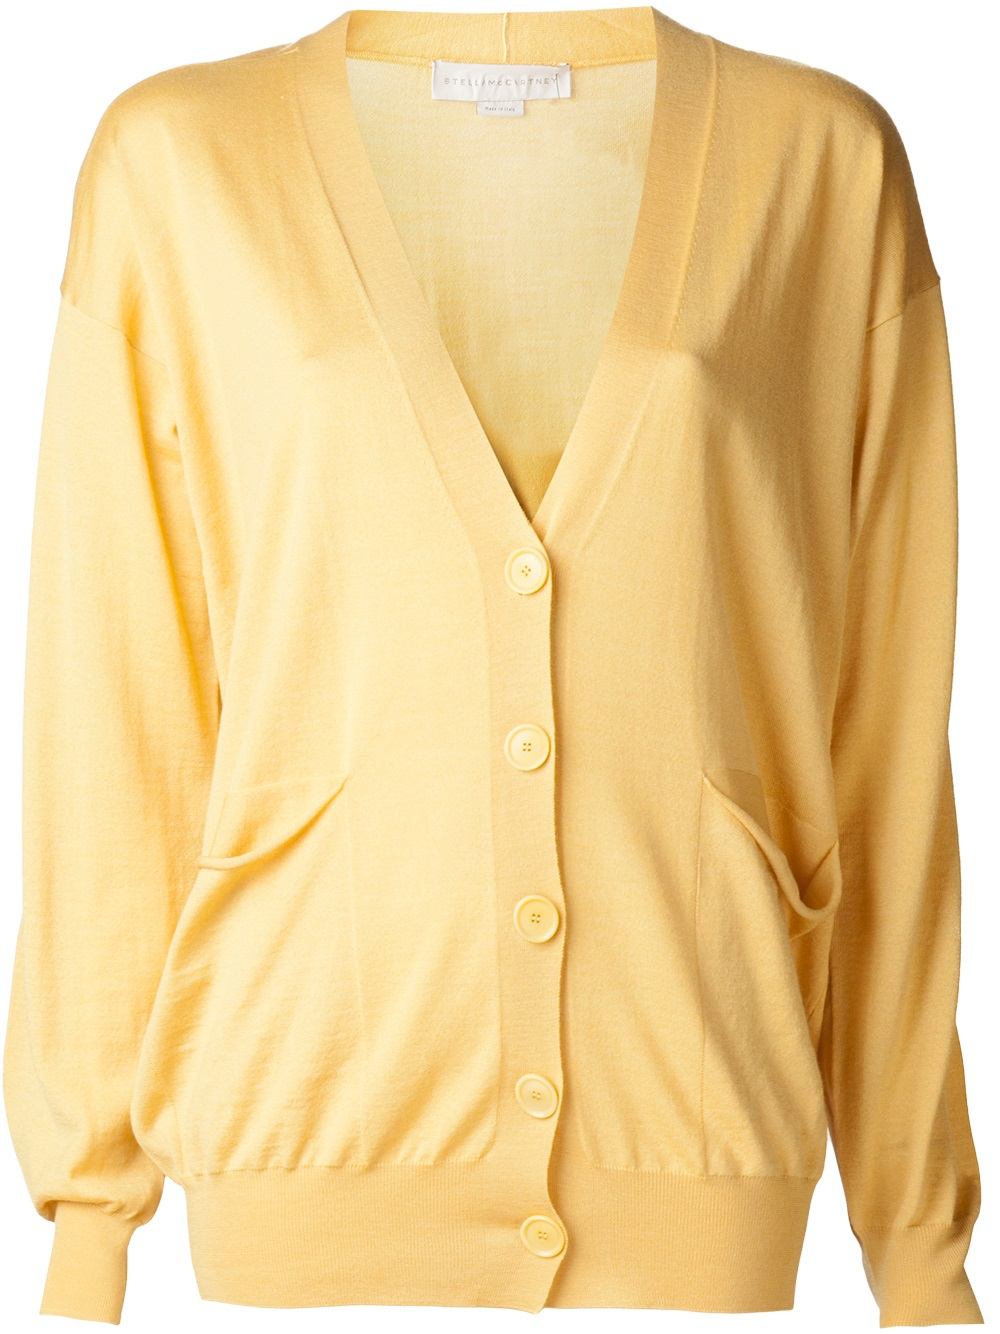 Stella mccartney Button Down Cardigan in Orange | Lyst